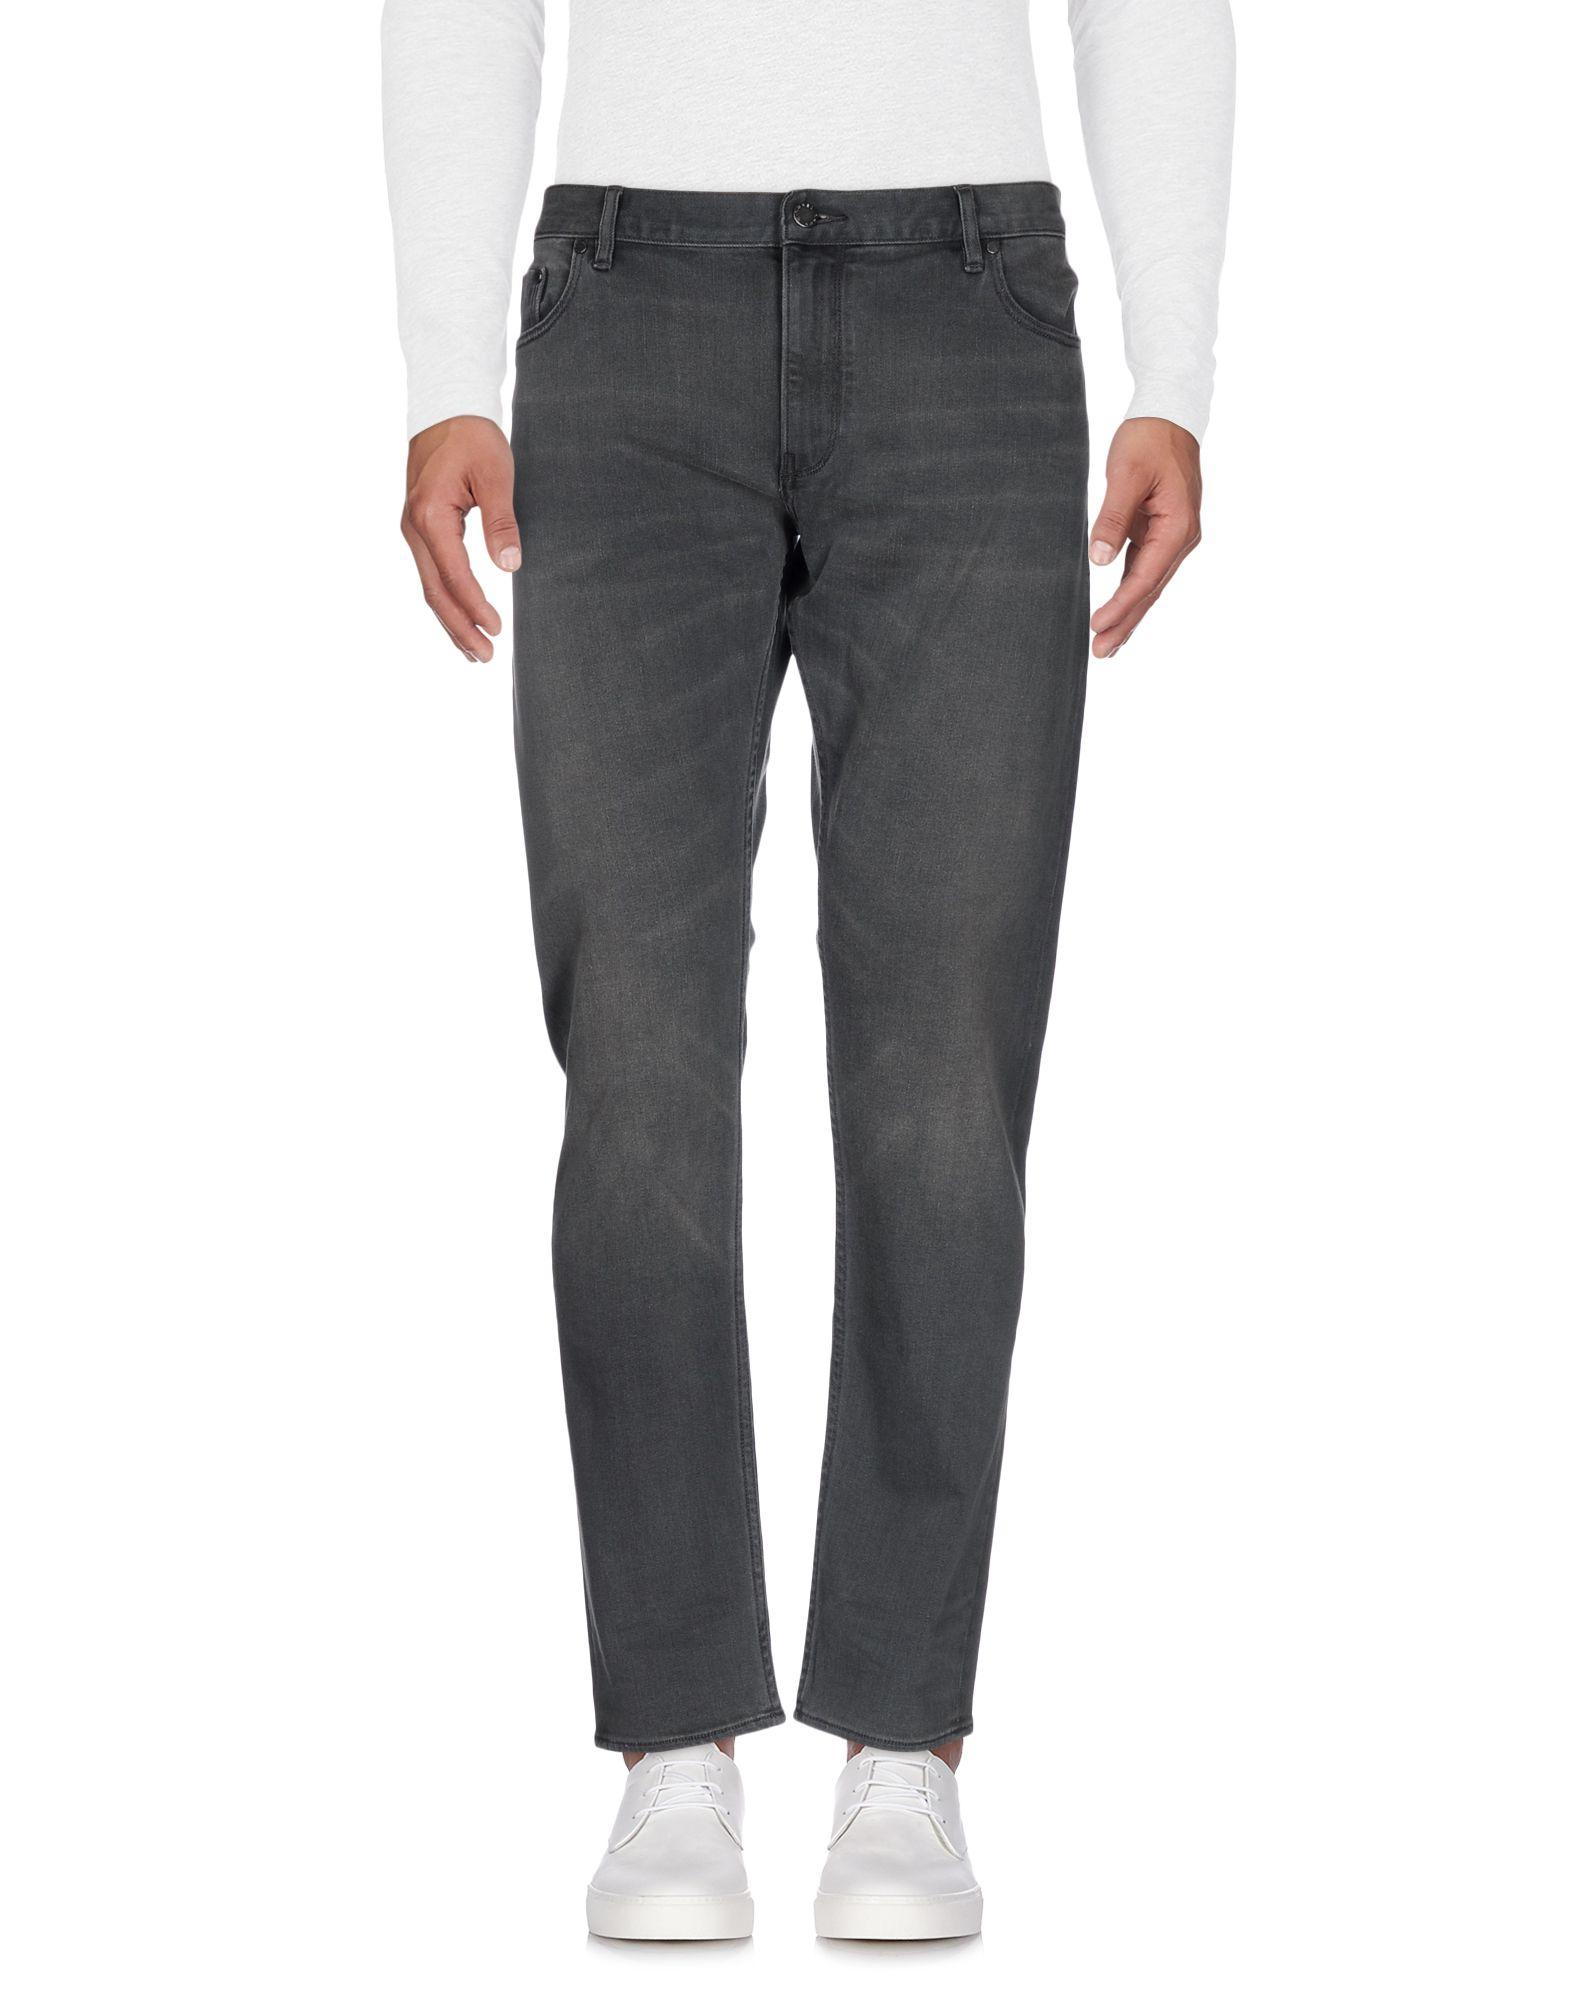 MICHAEL KORS Herren Jeanshose Farbe Grau Größe 14 jetztbilligerkaufen